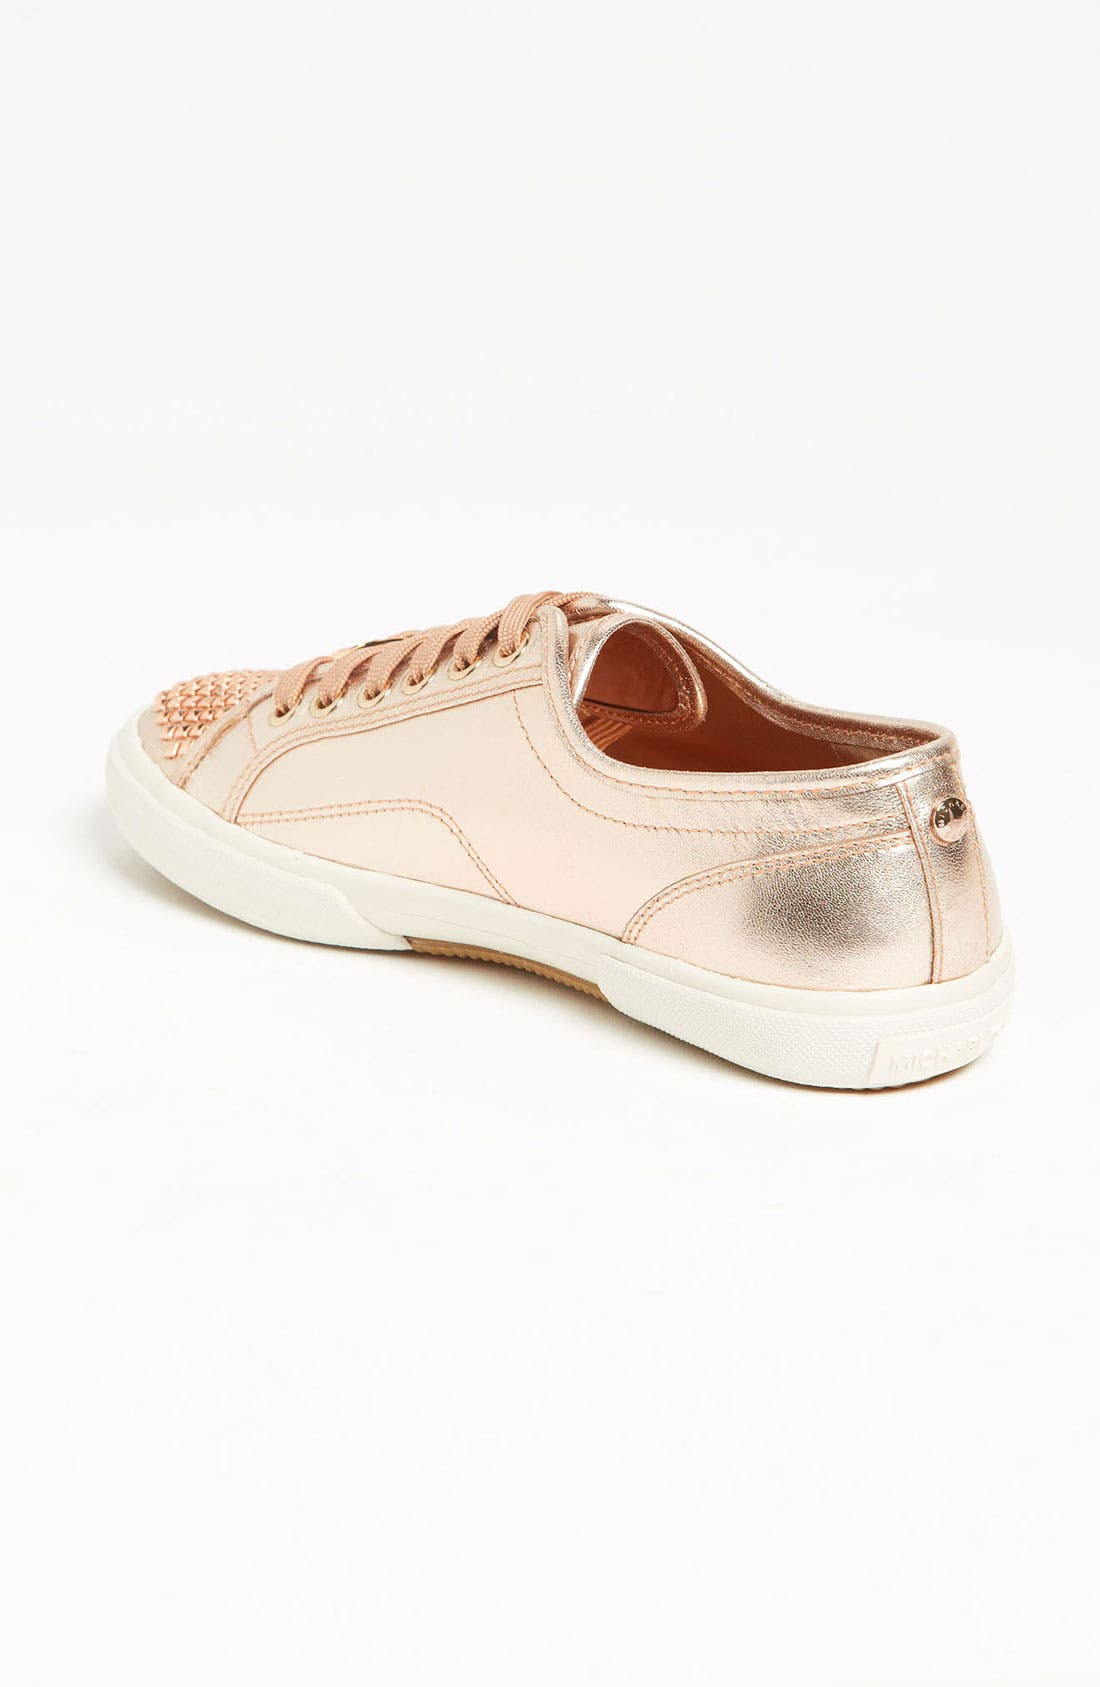 Alternate Image 2  - MICHAEL Michael Kors' Boerum' Studded Sneaker